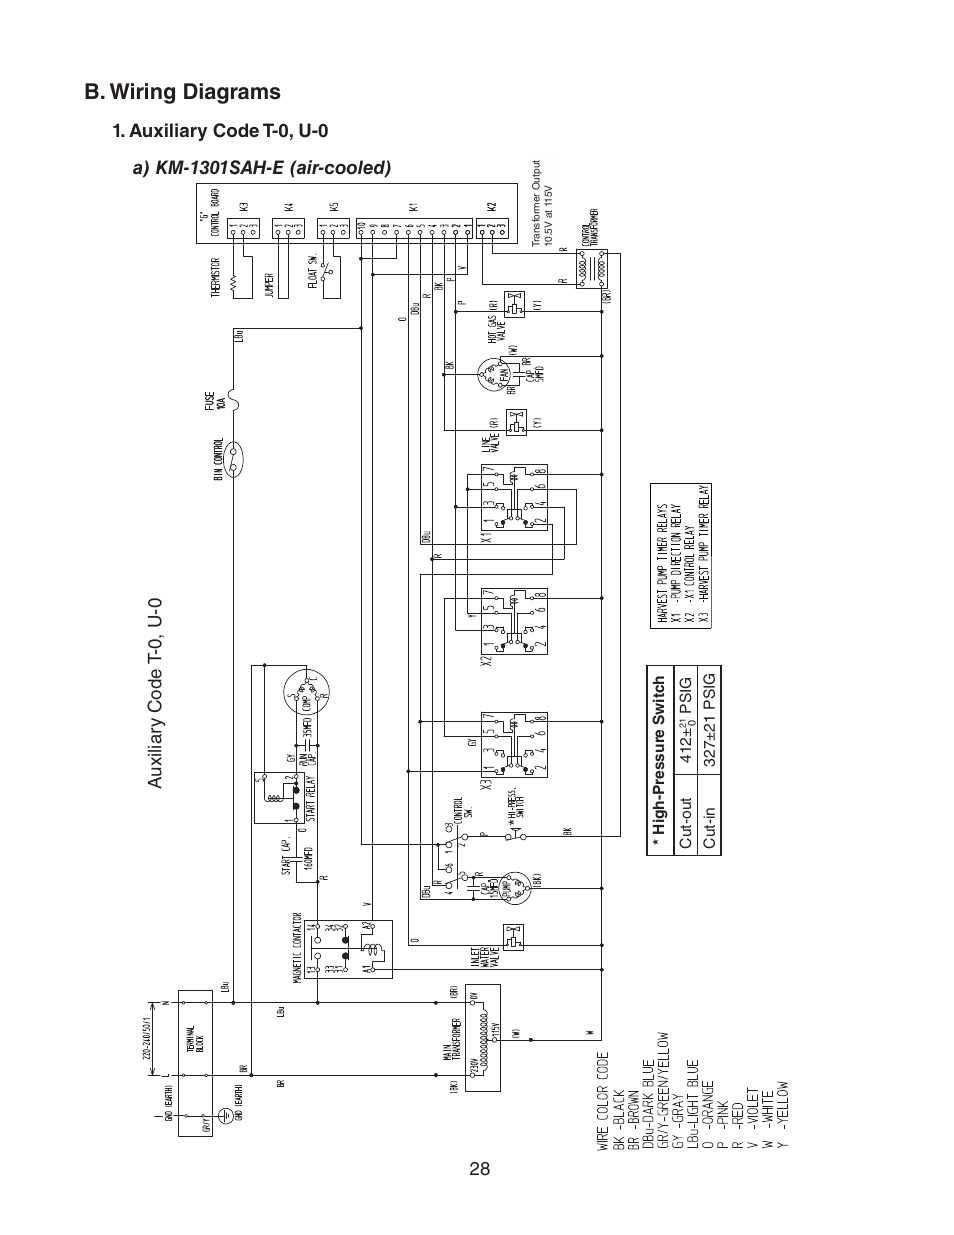 Hoaki Contactor Wiring Diagram | Wiring Diagram on john deere g100 motor, john deere g100 parts diagram, john deere g100 oil filter, john deere g100 accessories, john deere g100 steering, john deere g100 tires, john deere g100 headlight,